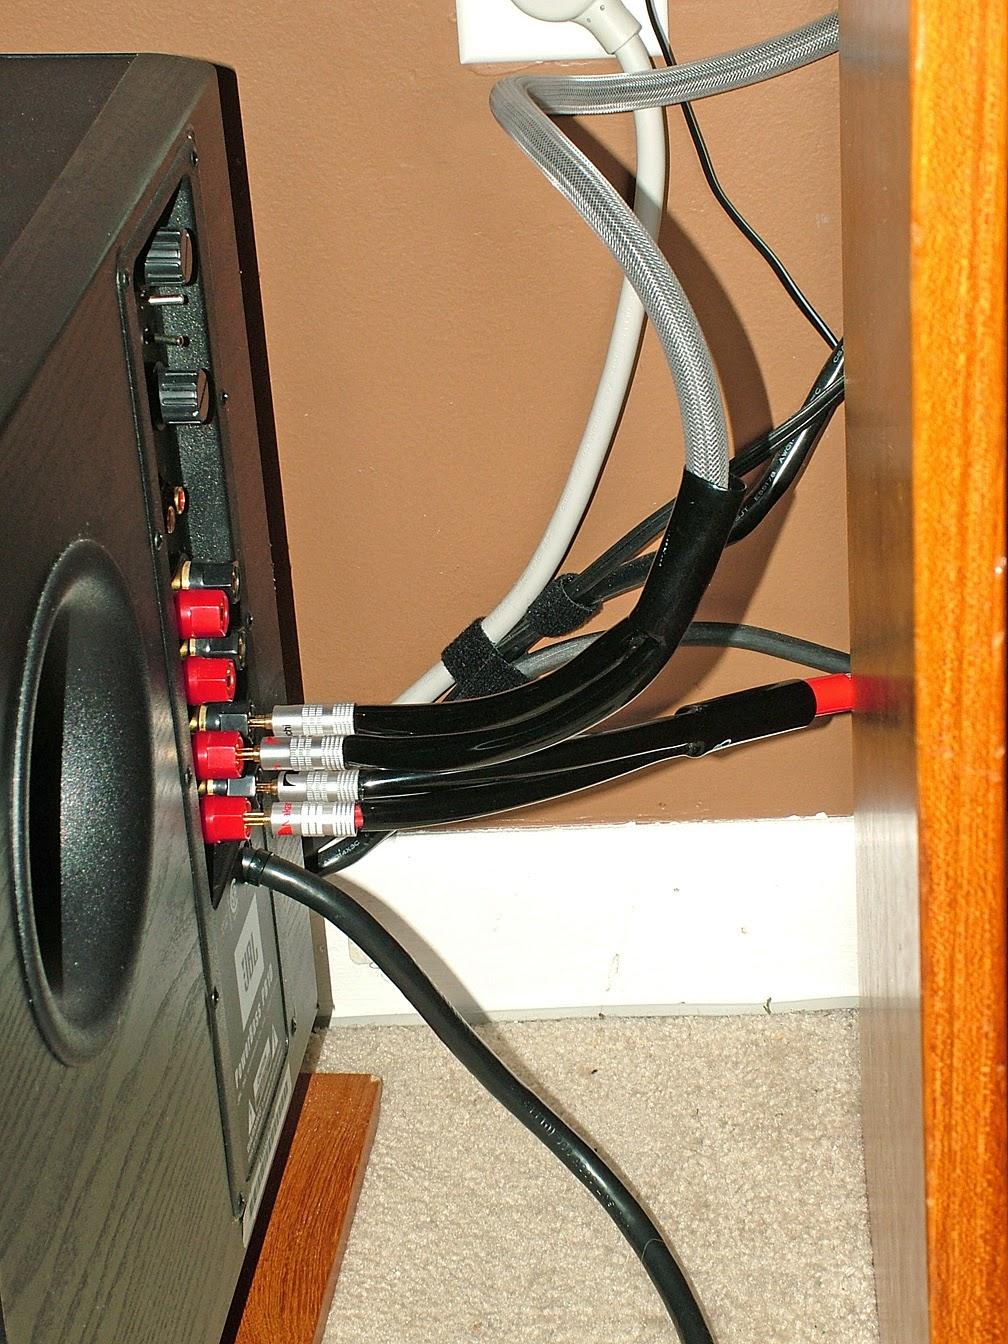 Wire For Speaker Systems : New polk speakers jbl subwoofer and wiring tweaks